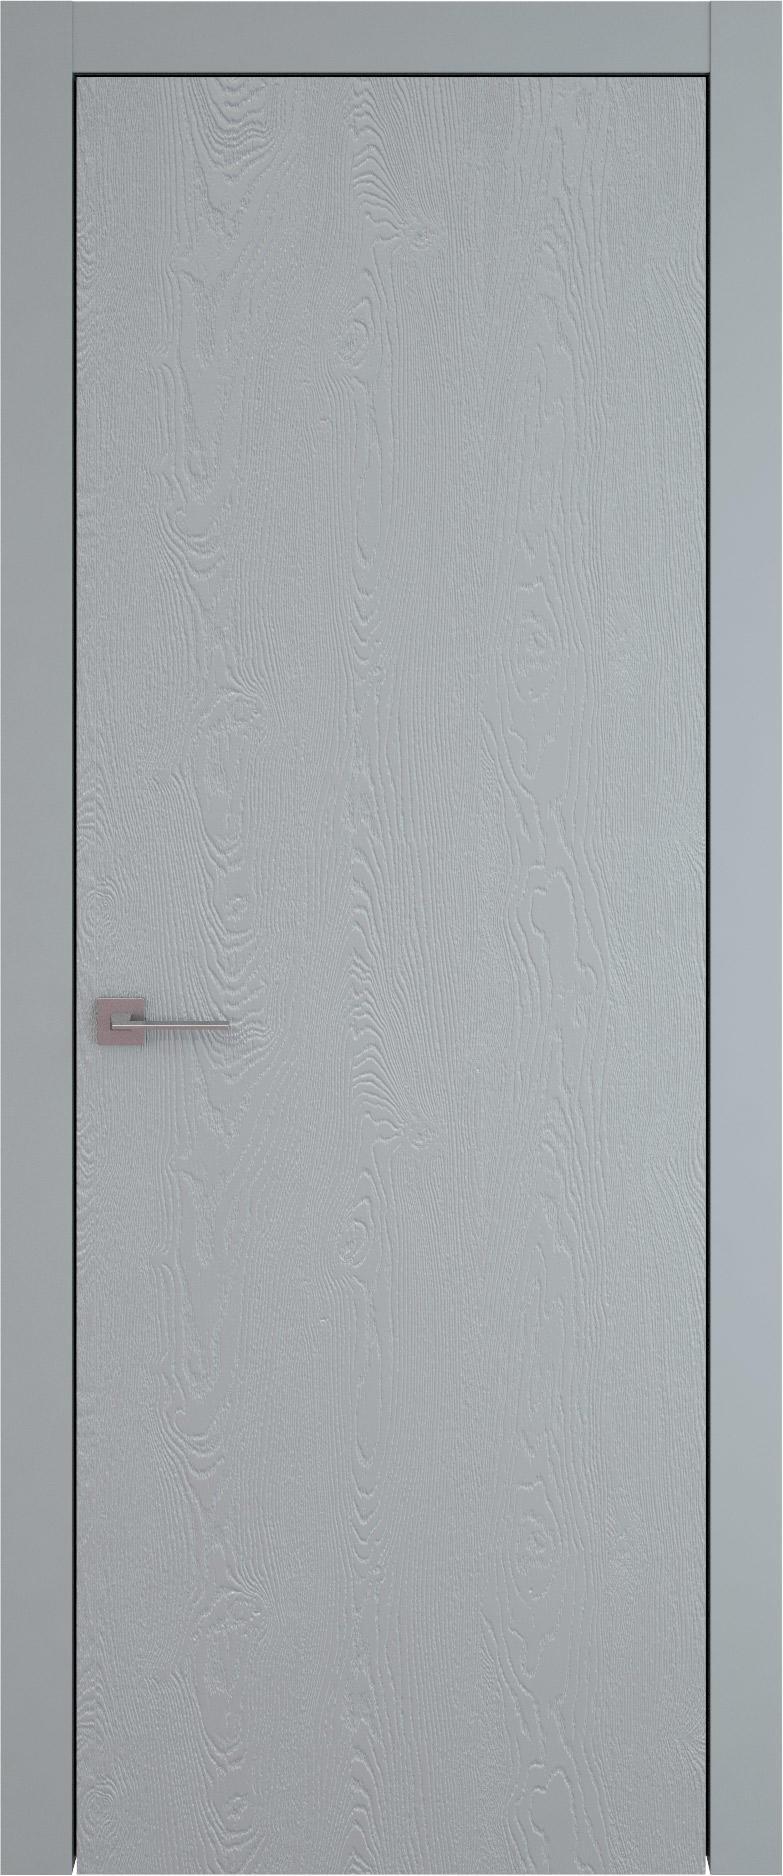 Tivoli А-1 цвет - Серебристо-серая эмаль по шпону (RAL 7045) Без стекла (ДГ)